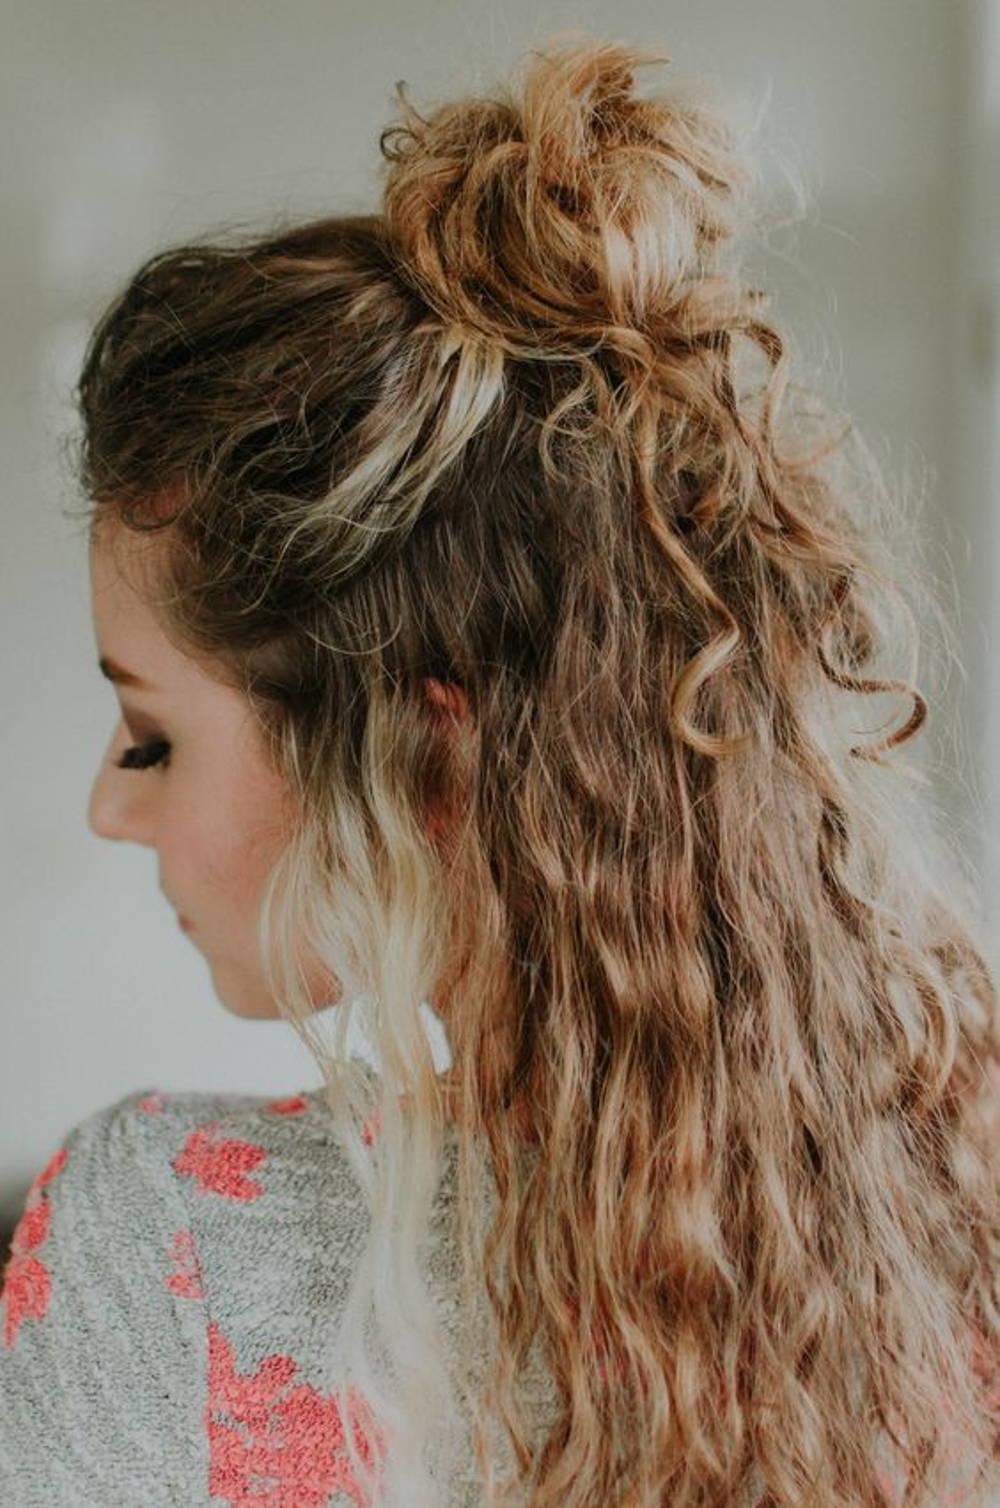 Top knot curls